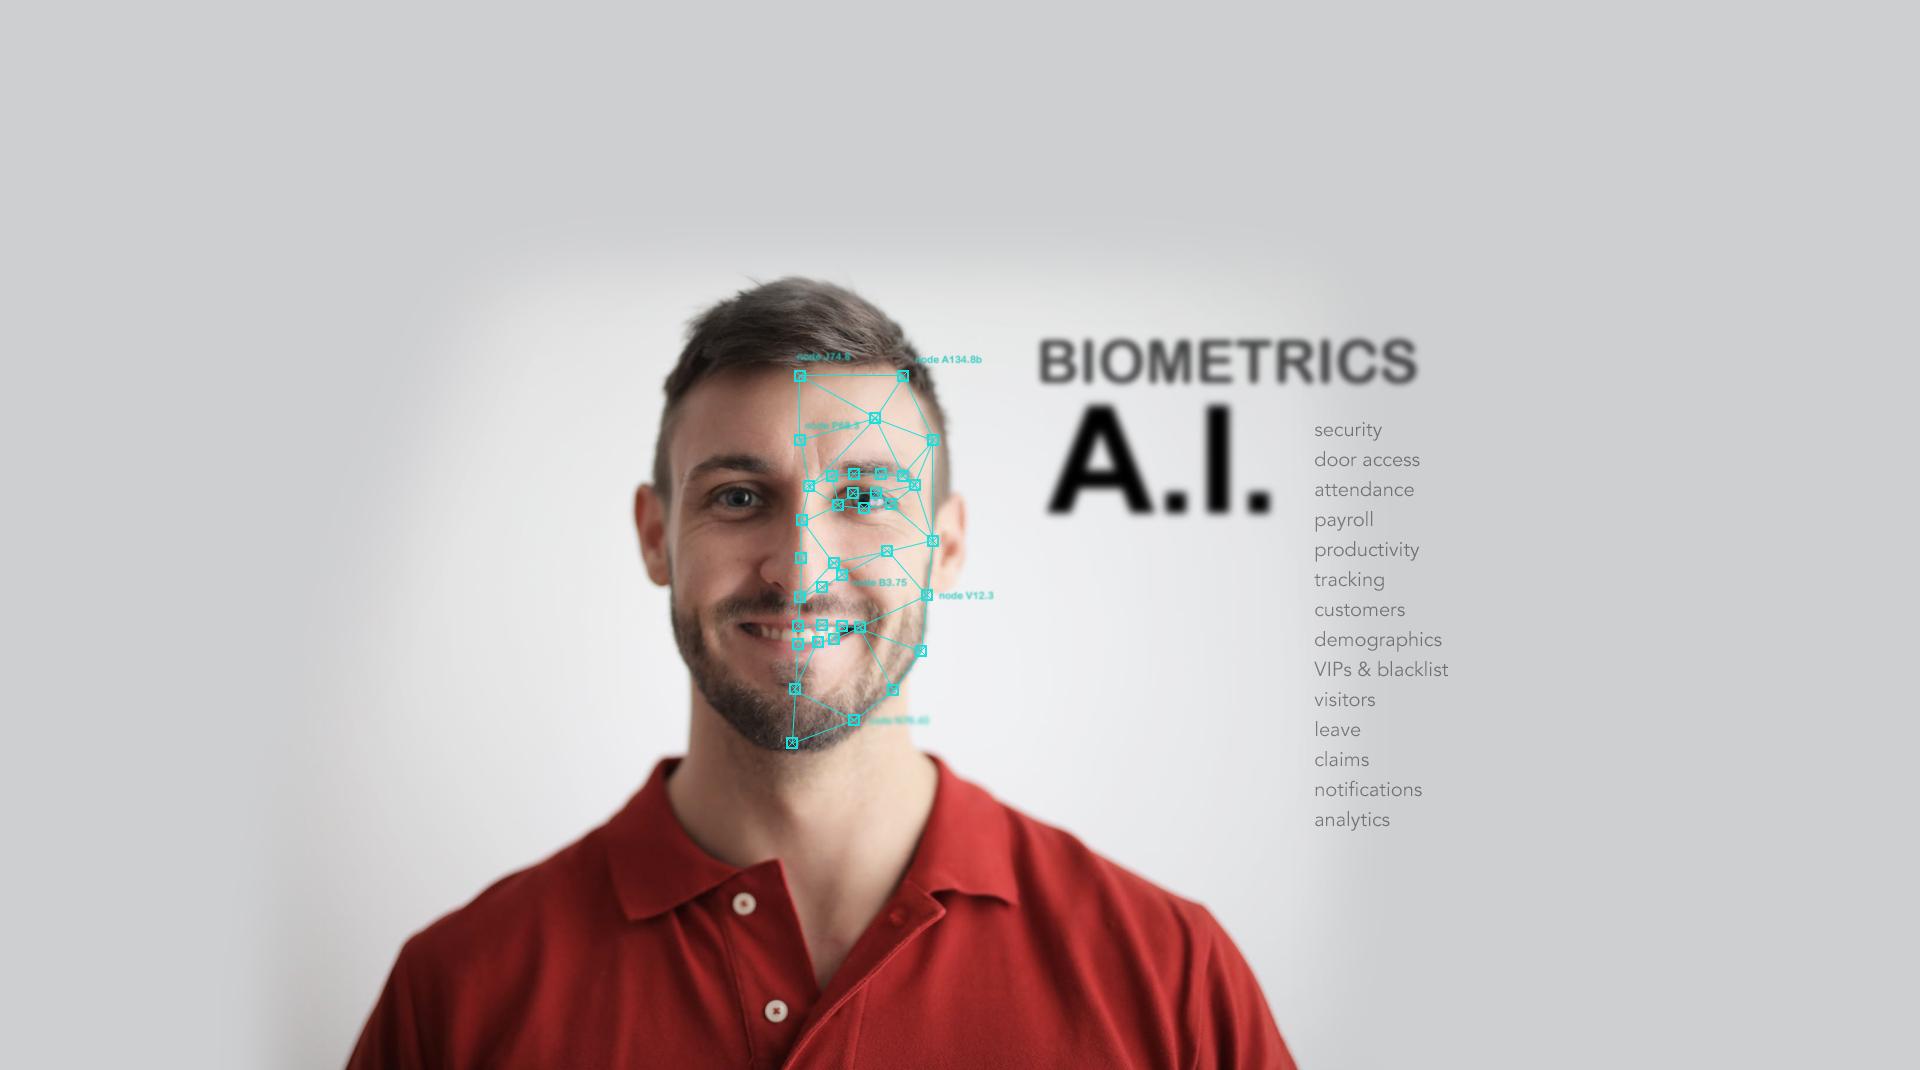 man-scanned-by-biometrics-facial-scanner